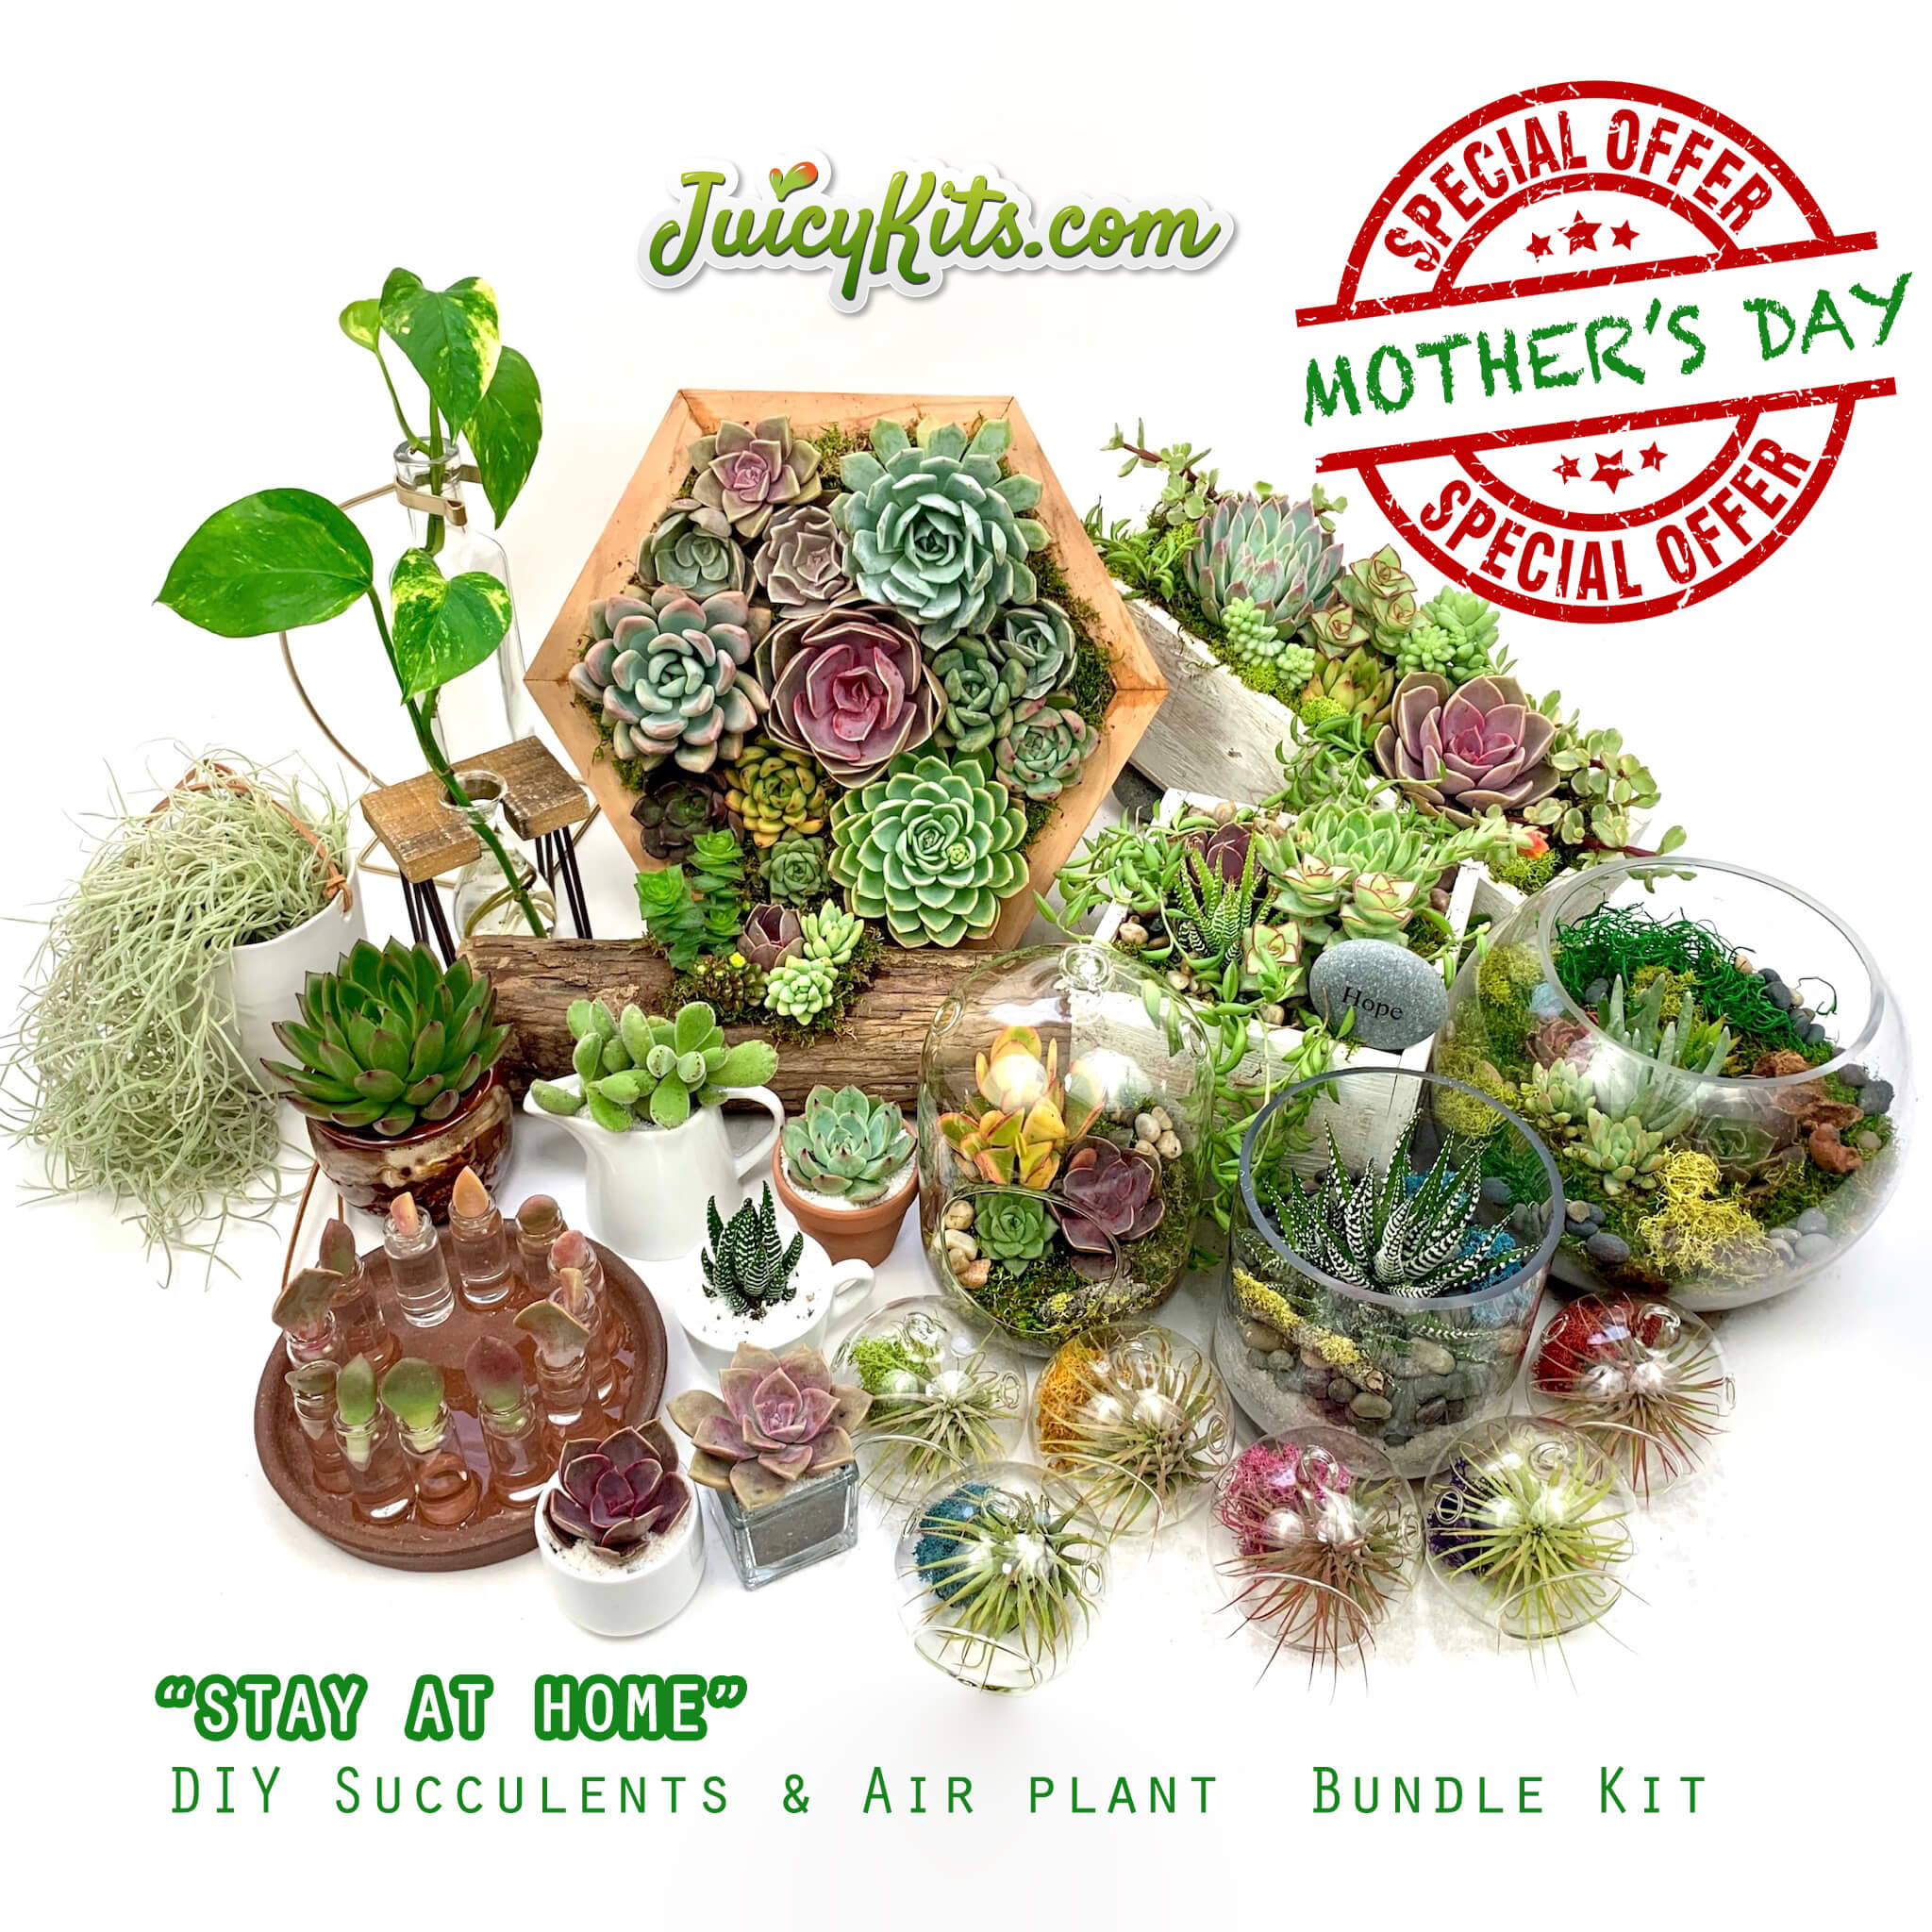 Stay At Home Diy Succulent Air Plant Bundle Kit Juicykits Com